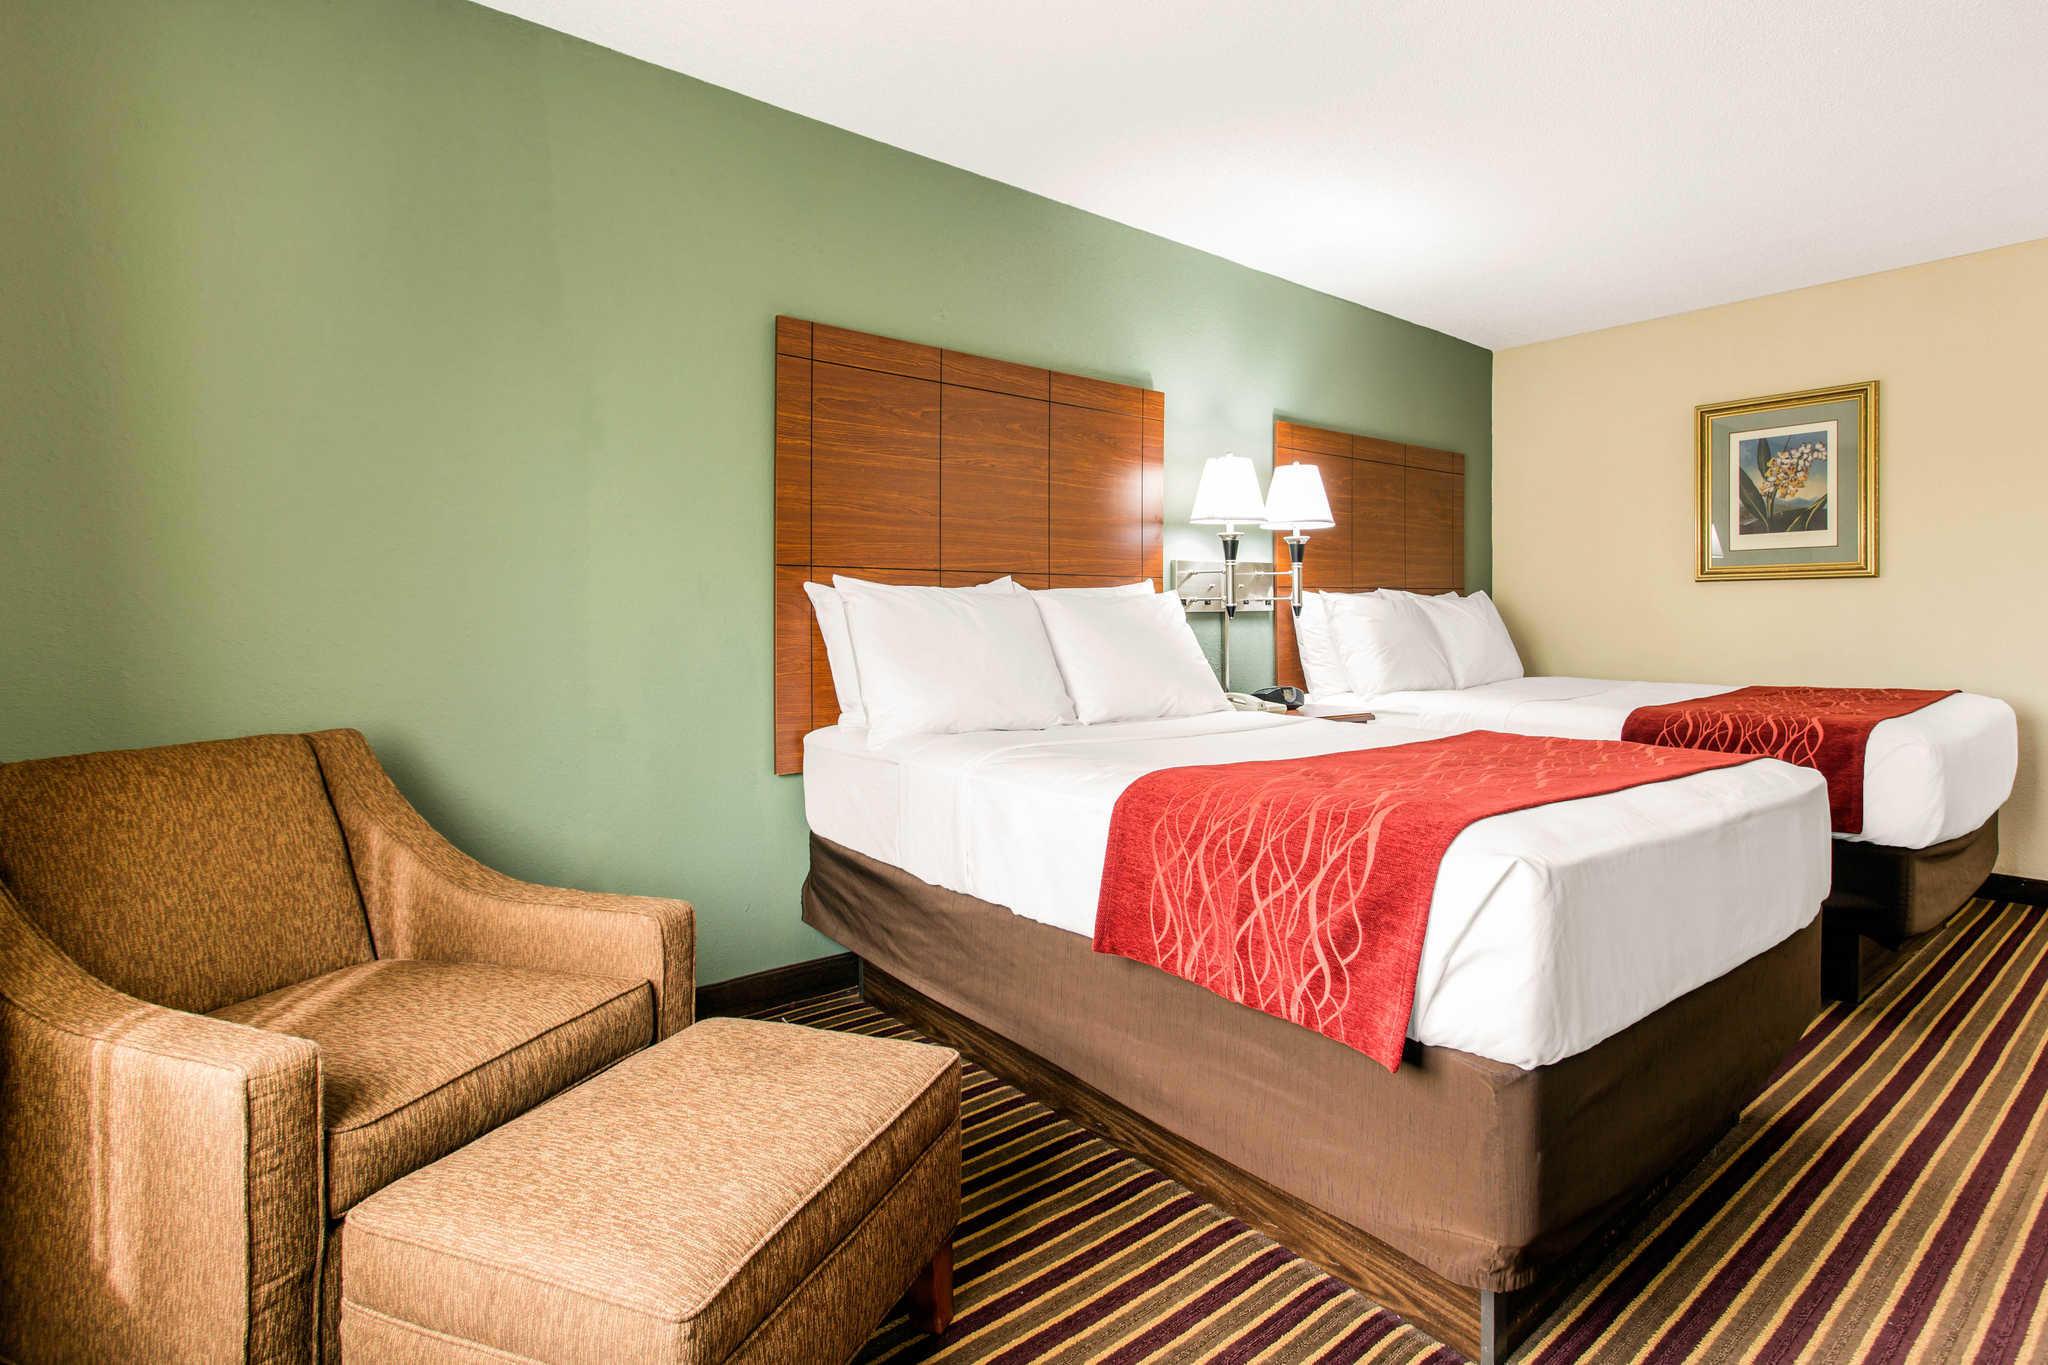 Comfort Inn & Suites Crabtree Valley image 7